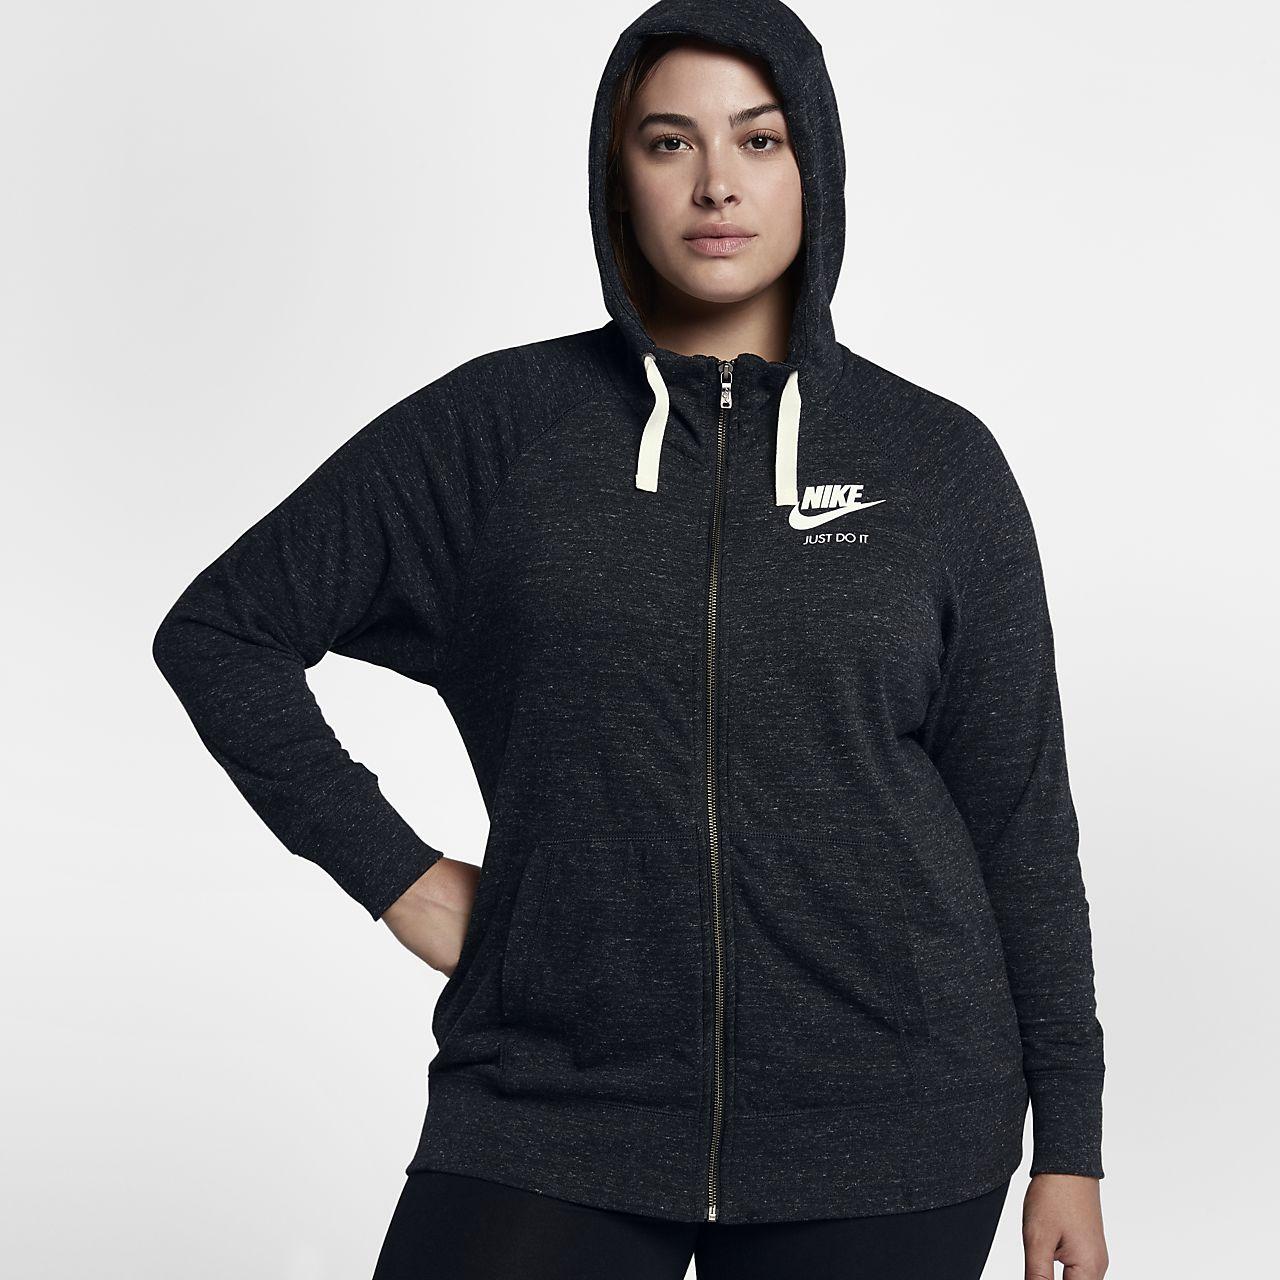 fb6ba99e7be Nike Sportswear Gym Vintage (Plus Size) Women s Full-Zip Hoodie ...